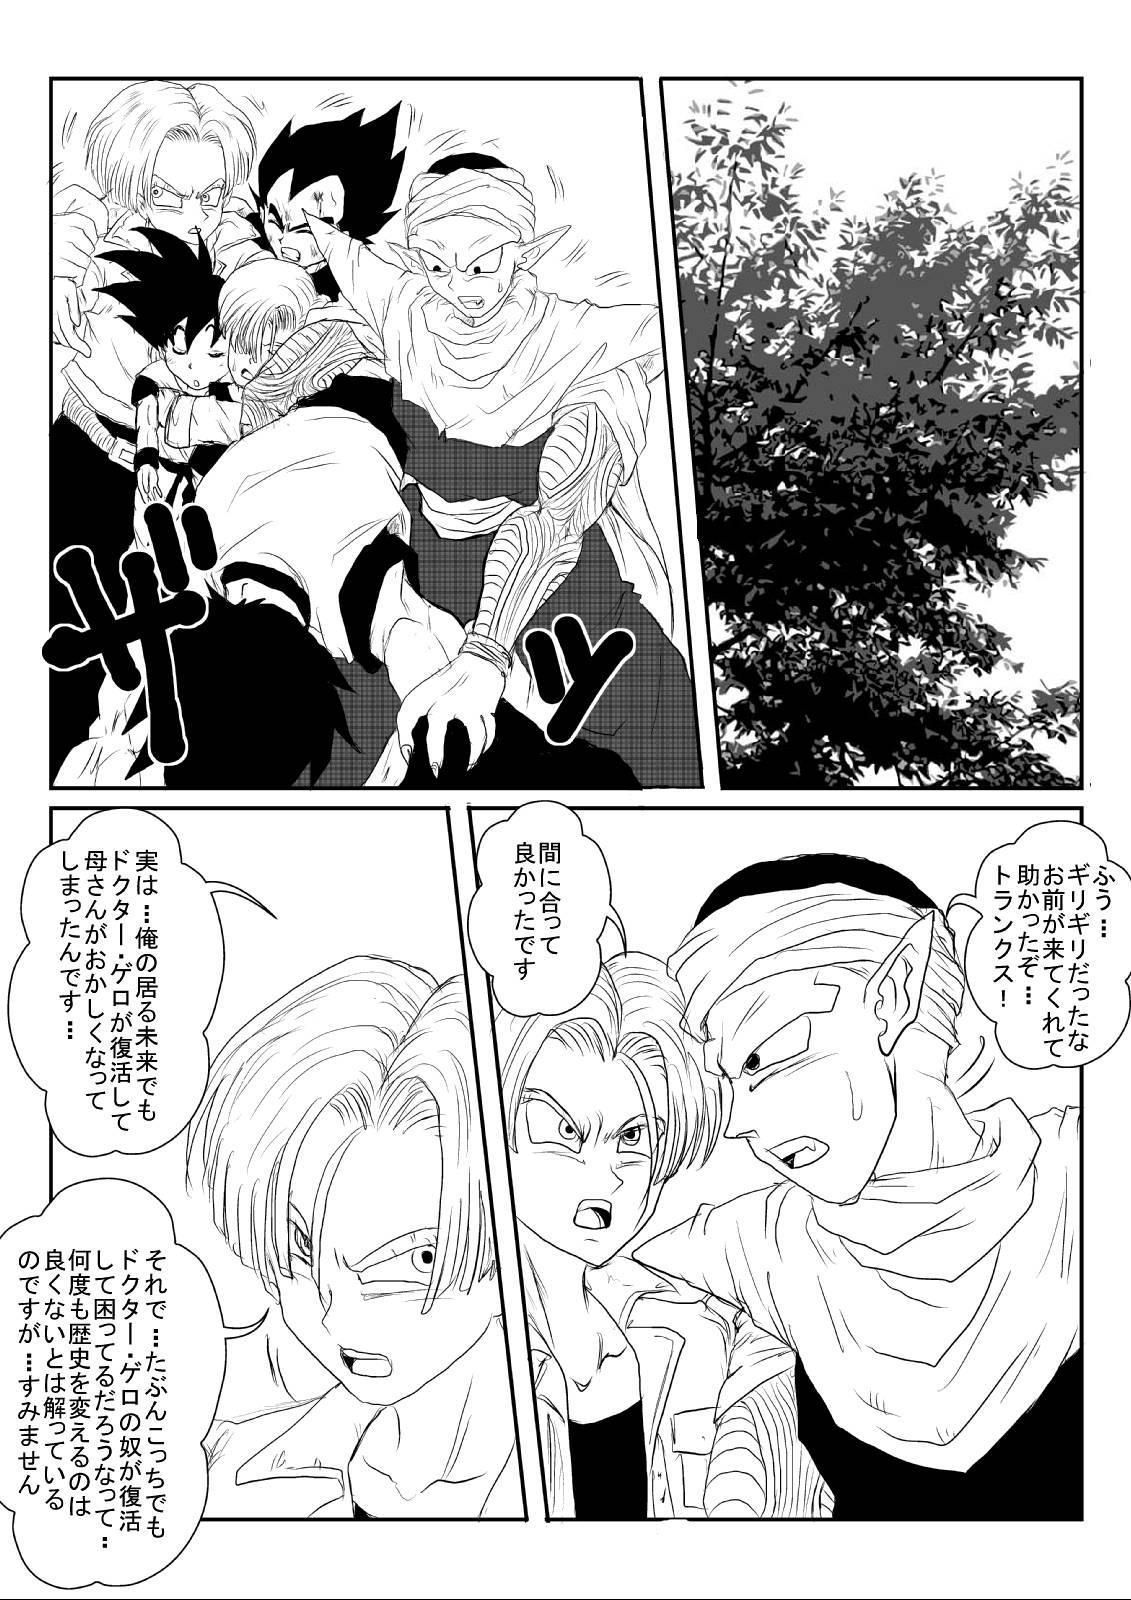 [Alice.Blood] Sennou Kyouiku-shitsu~ Jinzou ☆-kan 18-gou-hen (Dragon Ball Z) 9